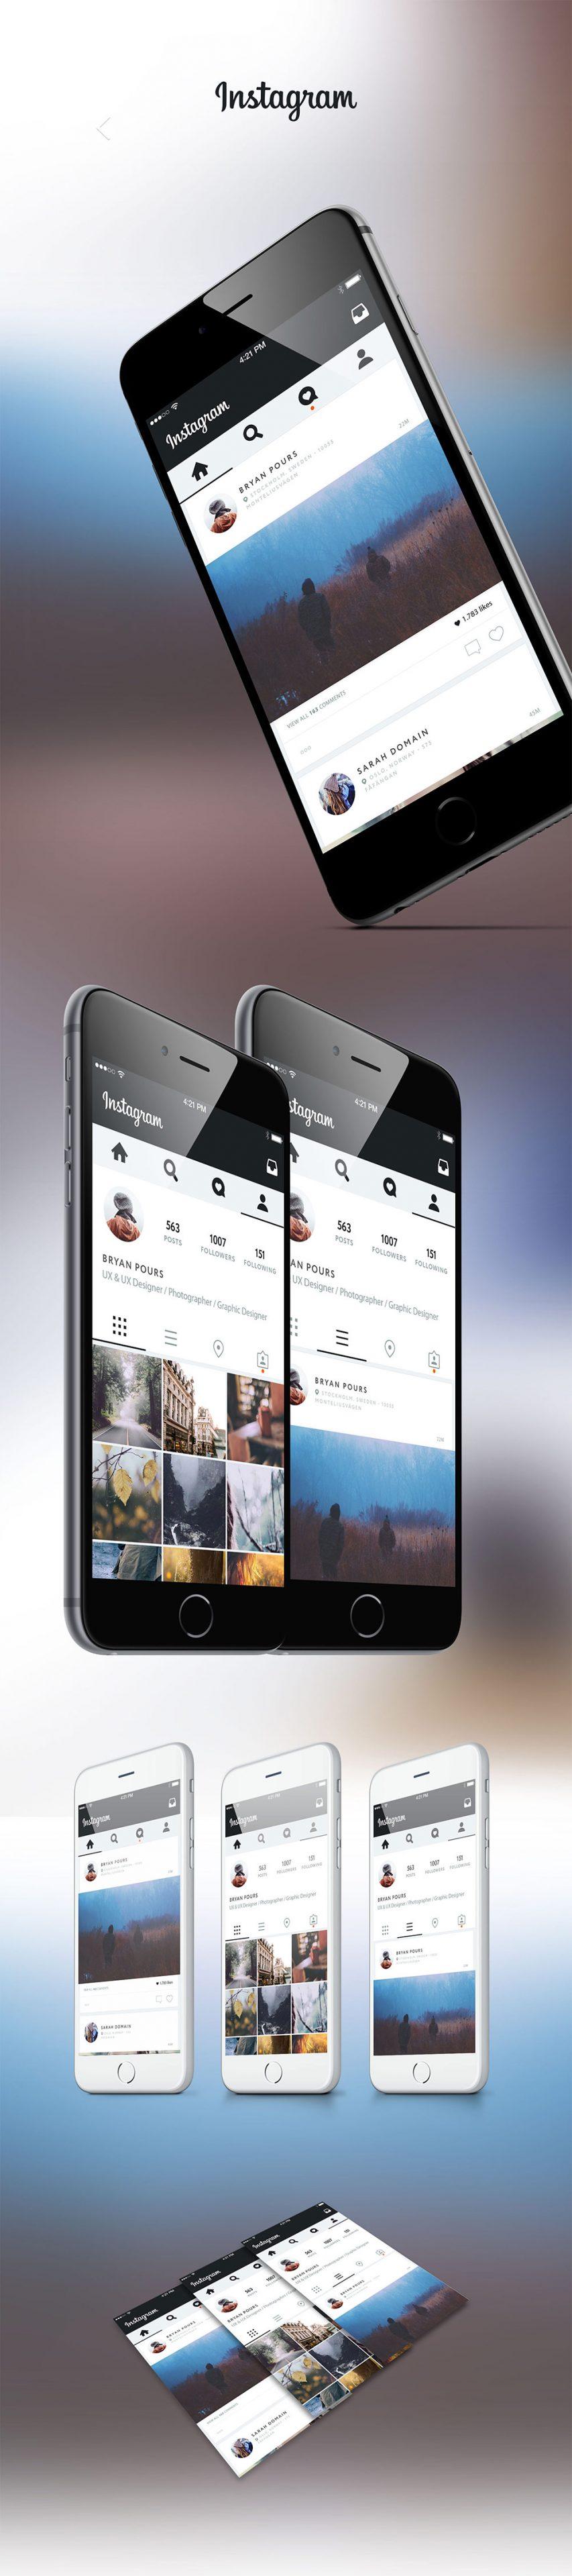 Instagram Application UI Revamp Concept Free